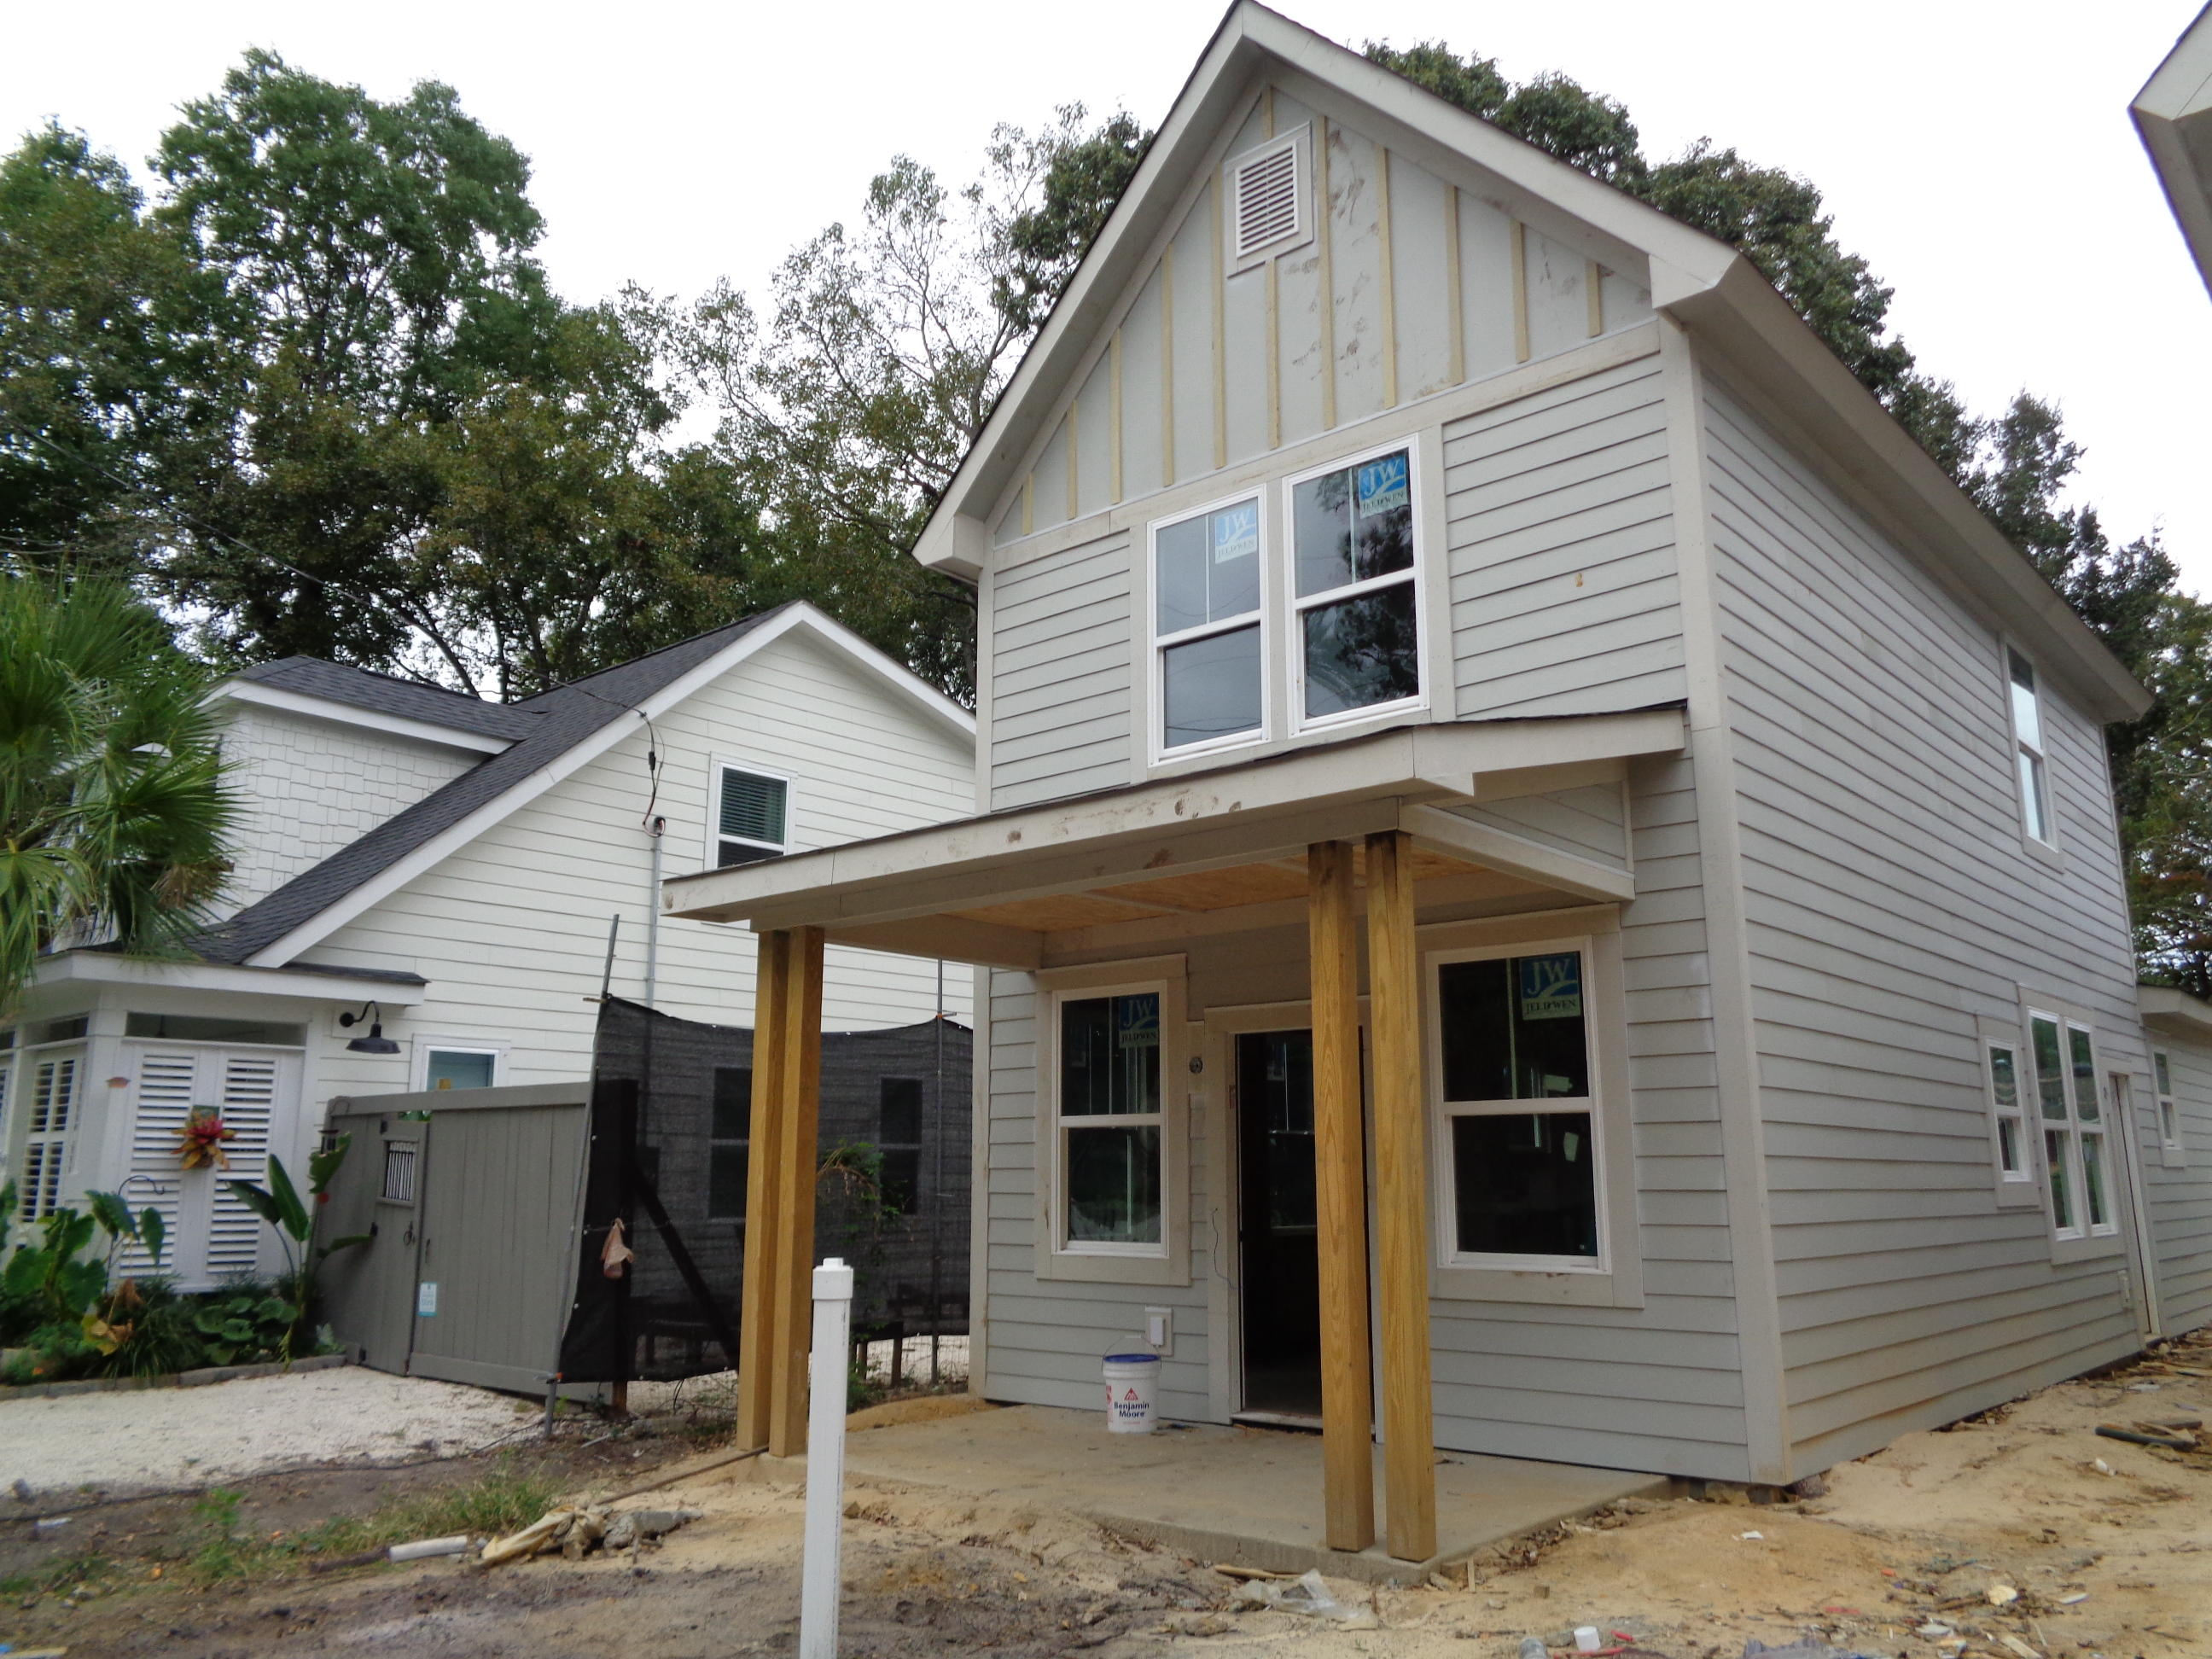 Pinecrest Gardens Homes For Sale - 1630 Wappoo, Charleston, SC - 17